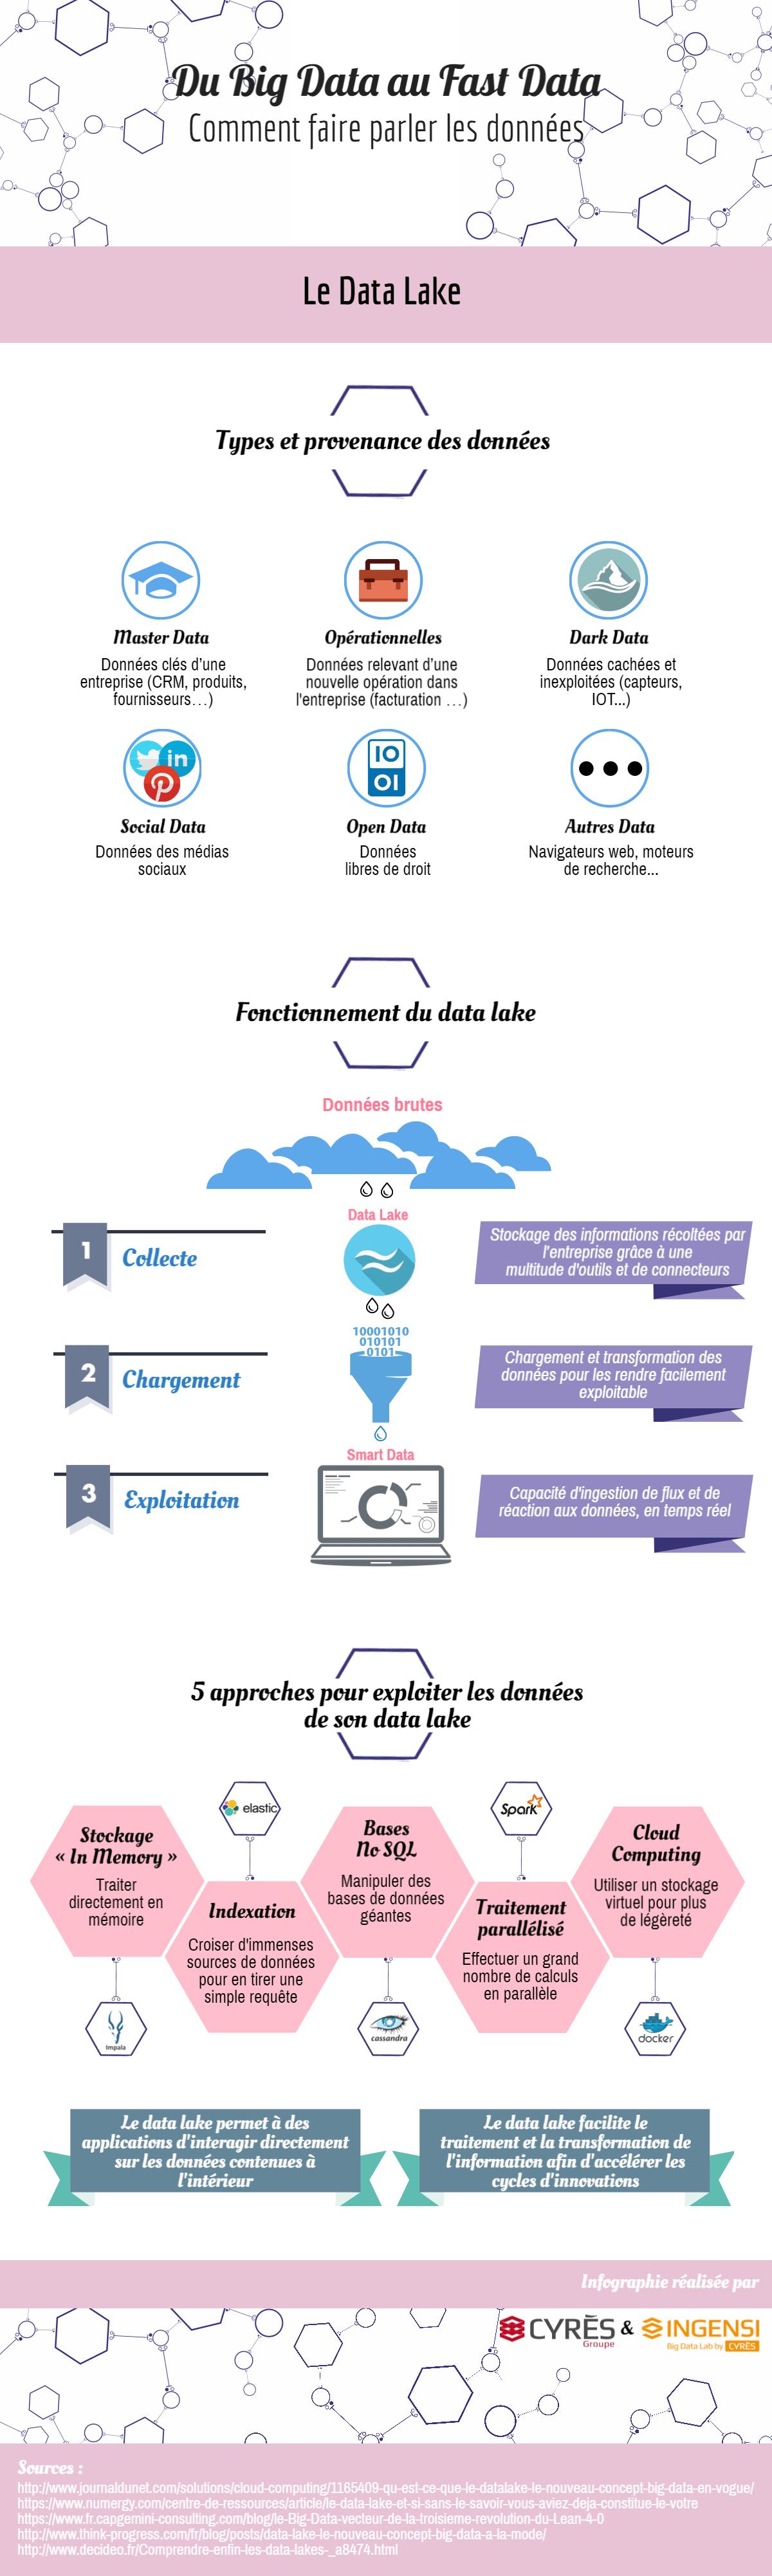 2 Infographie_Du Big Data au Fast Data_Le Data Lake